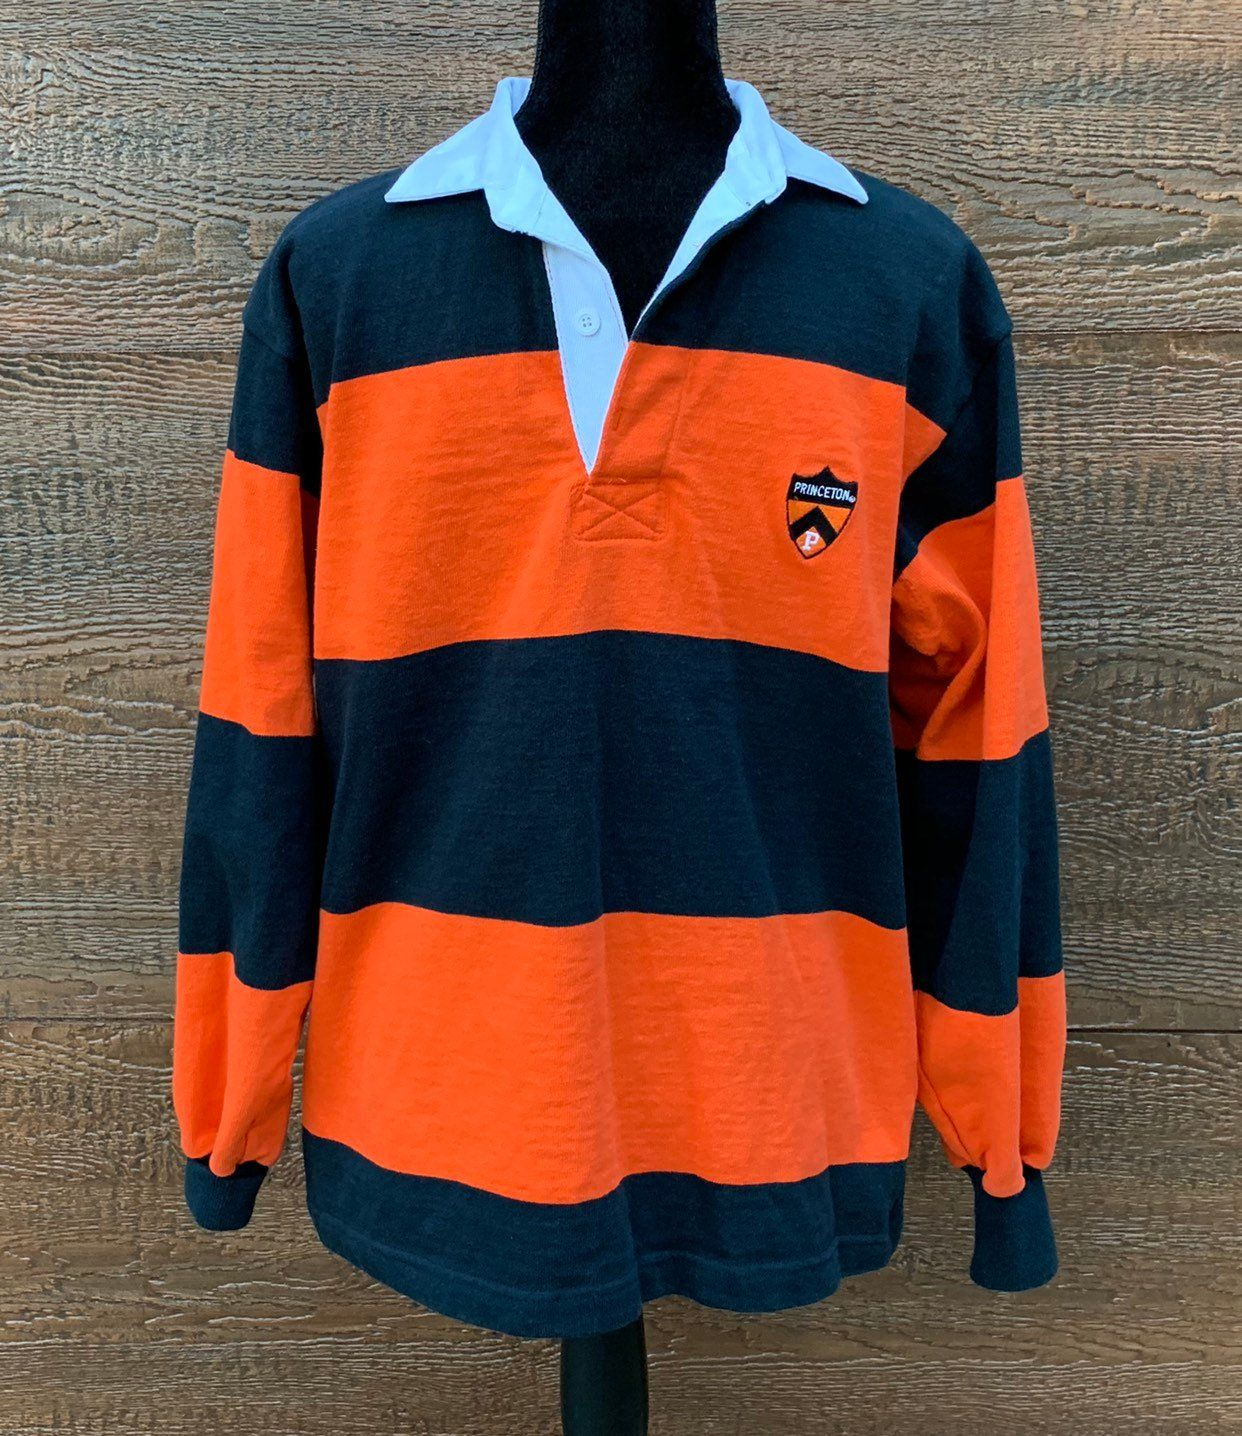 Princeton University Vintage80s Orange Black Striped Rugby Shirt Men S Medium Https Etsy Me 2mhvbqr Clothing Navy Striped Shirt Mens Shirts Rugby Shirt